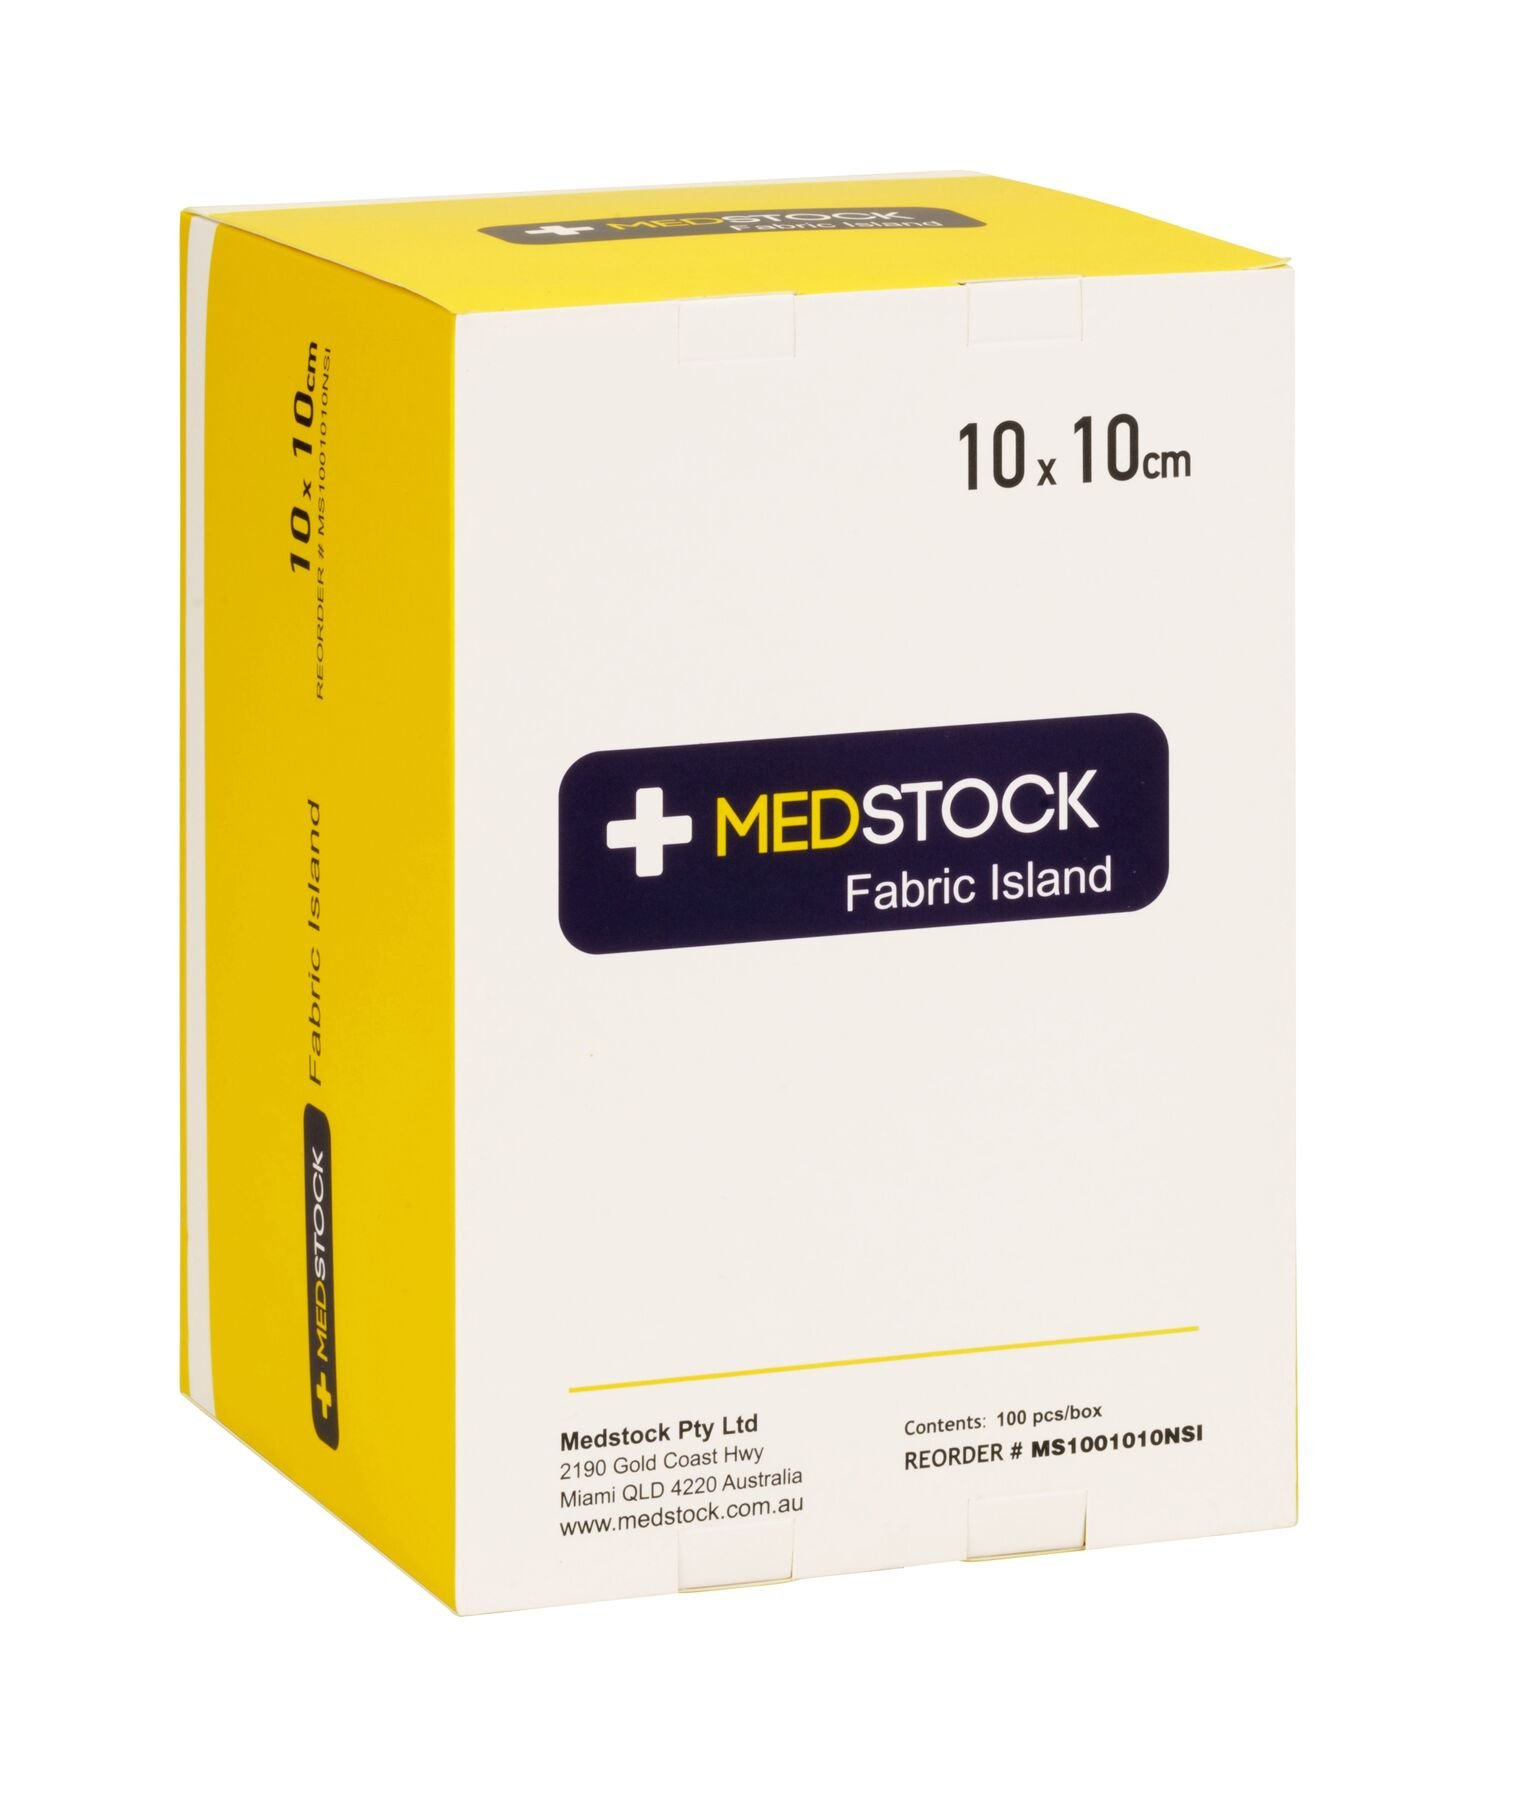 MEDSTOCK FABRIC ISLAND DRESSING 10CM X 10CM, BOX 100